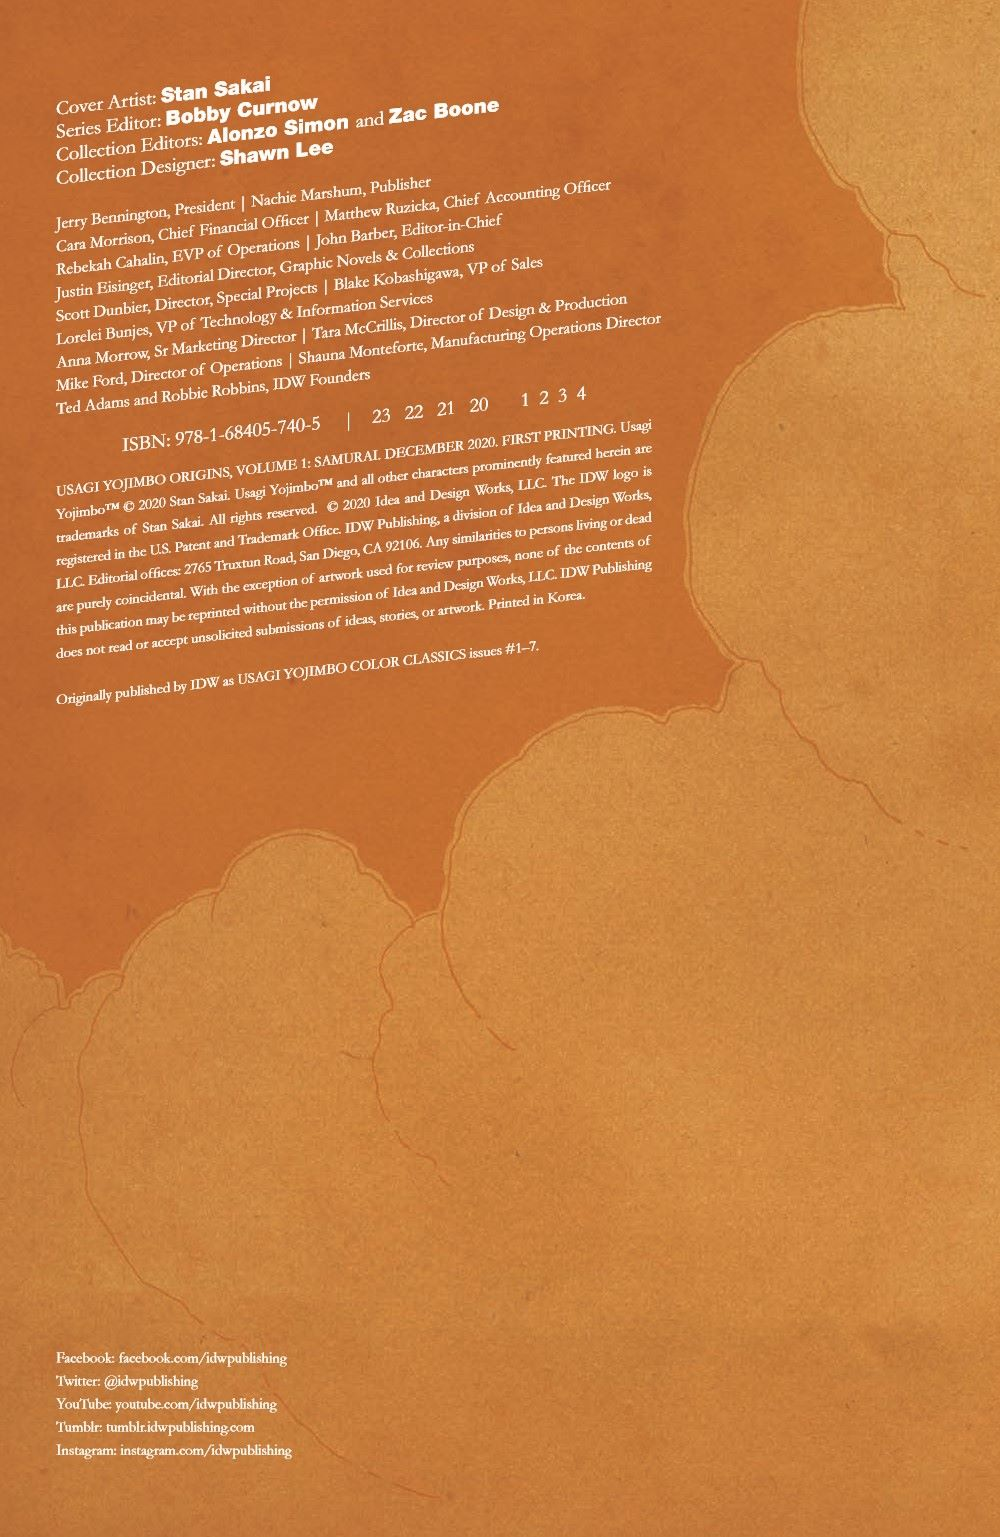 Usagi-Origins-v01-pr-2 ComicList Previews: USAGI YOJIMBO ORIGINS VOLUME 1 SAMURAI TP